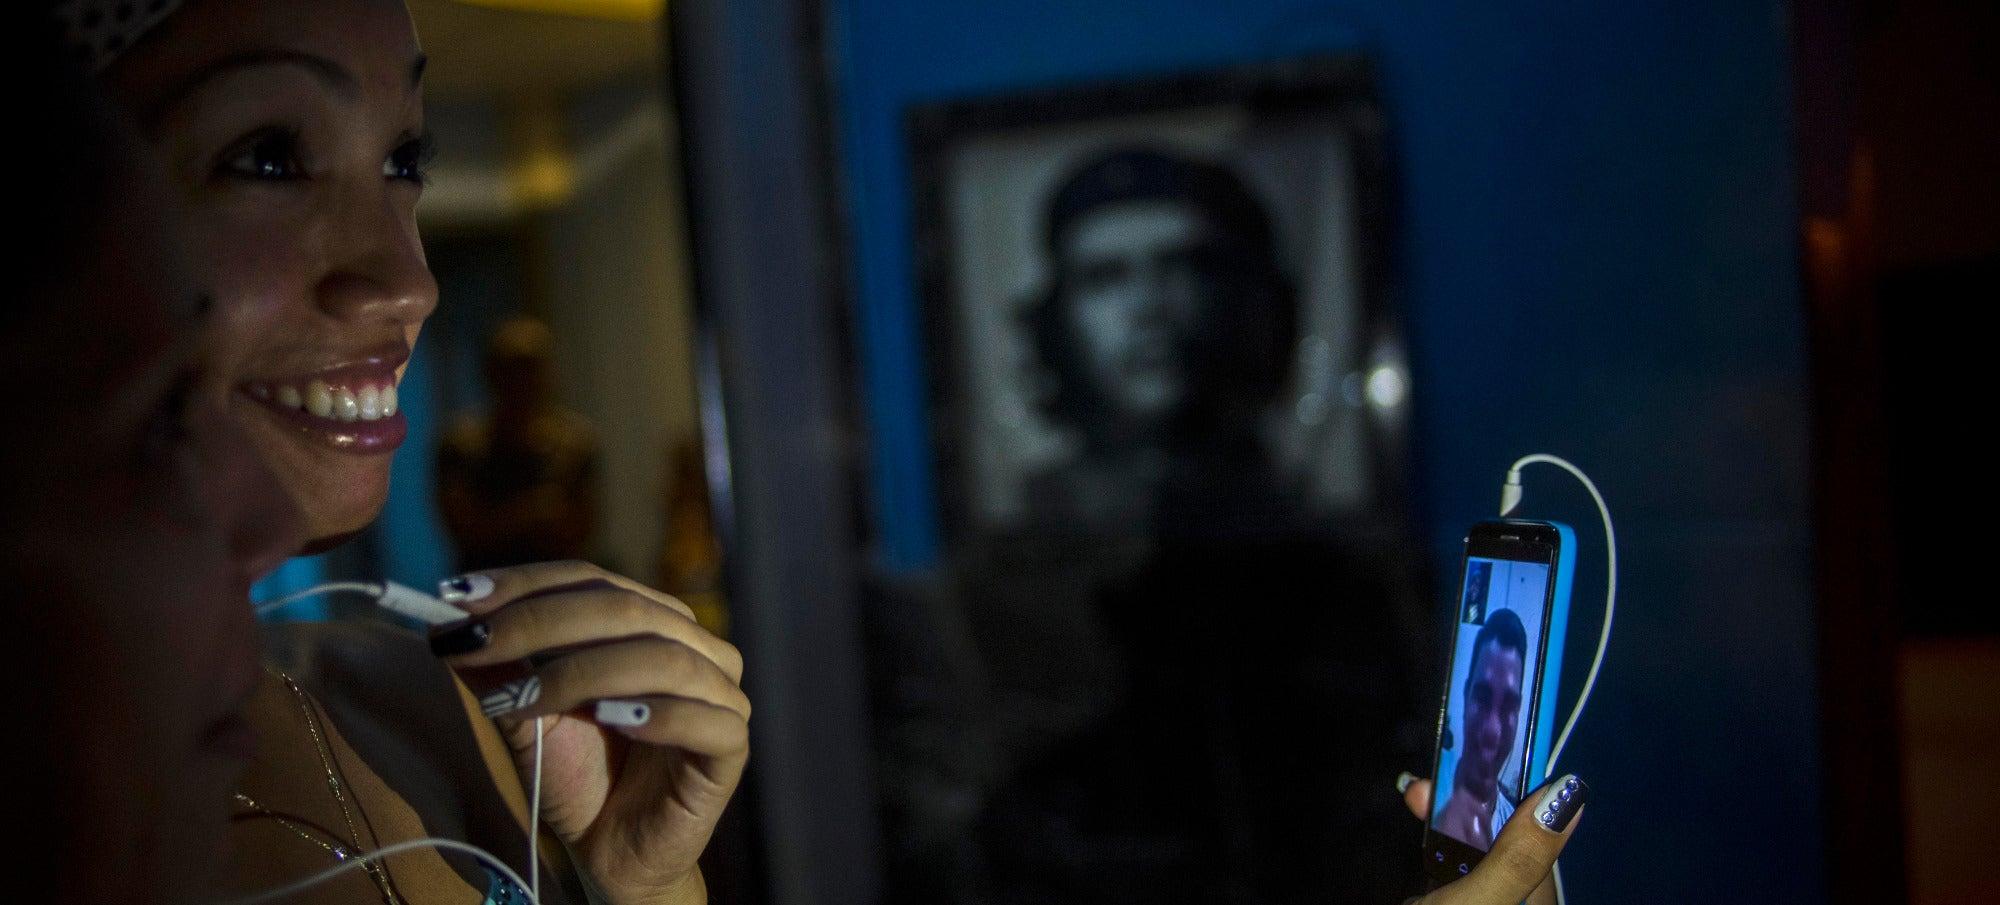 Cuba Is Finally Getting Home Broadband